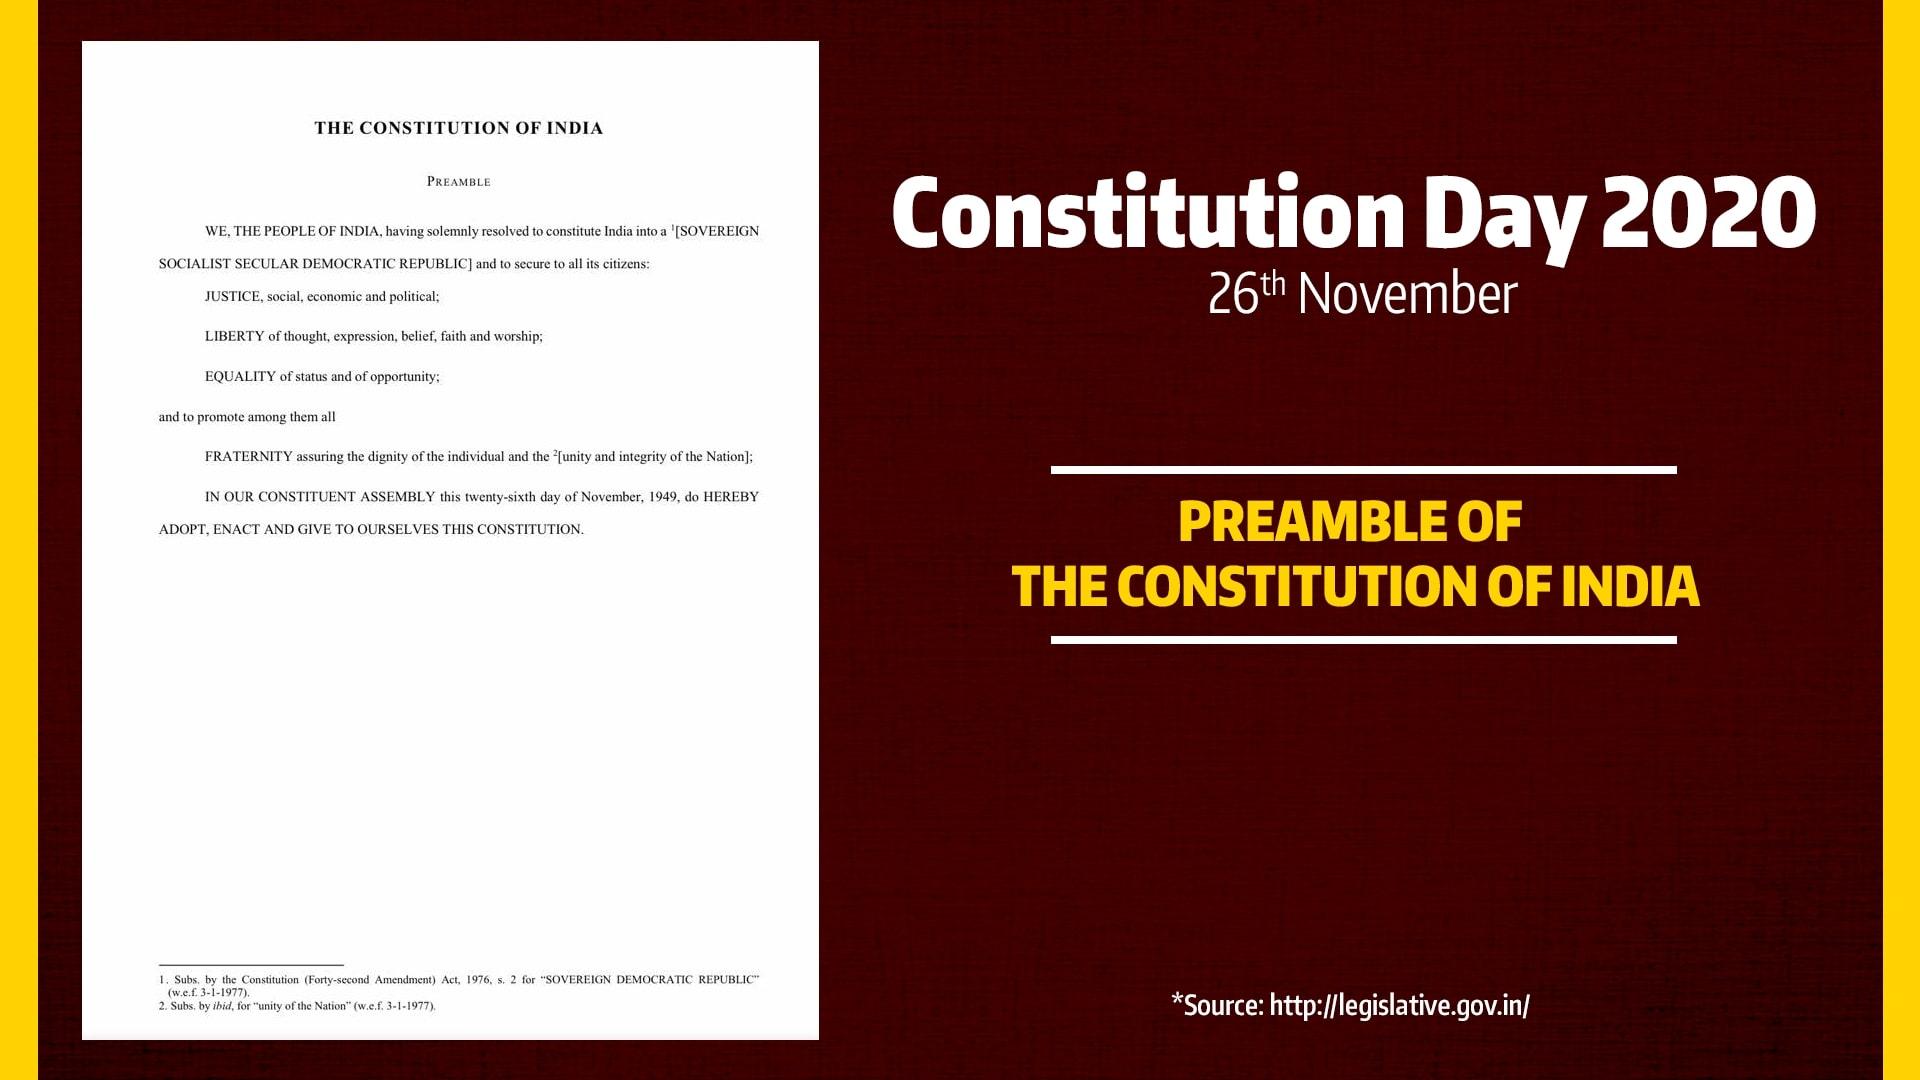 Constitution Day, 26 November 2020